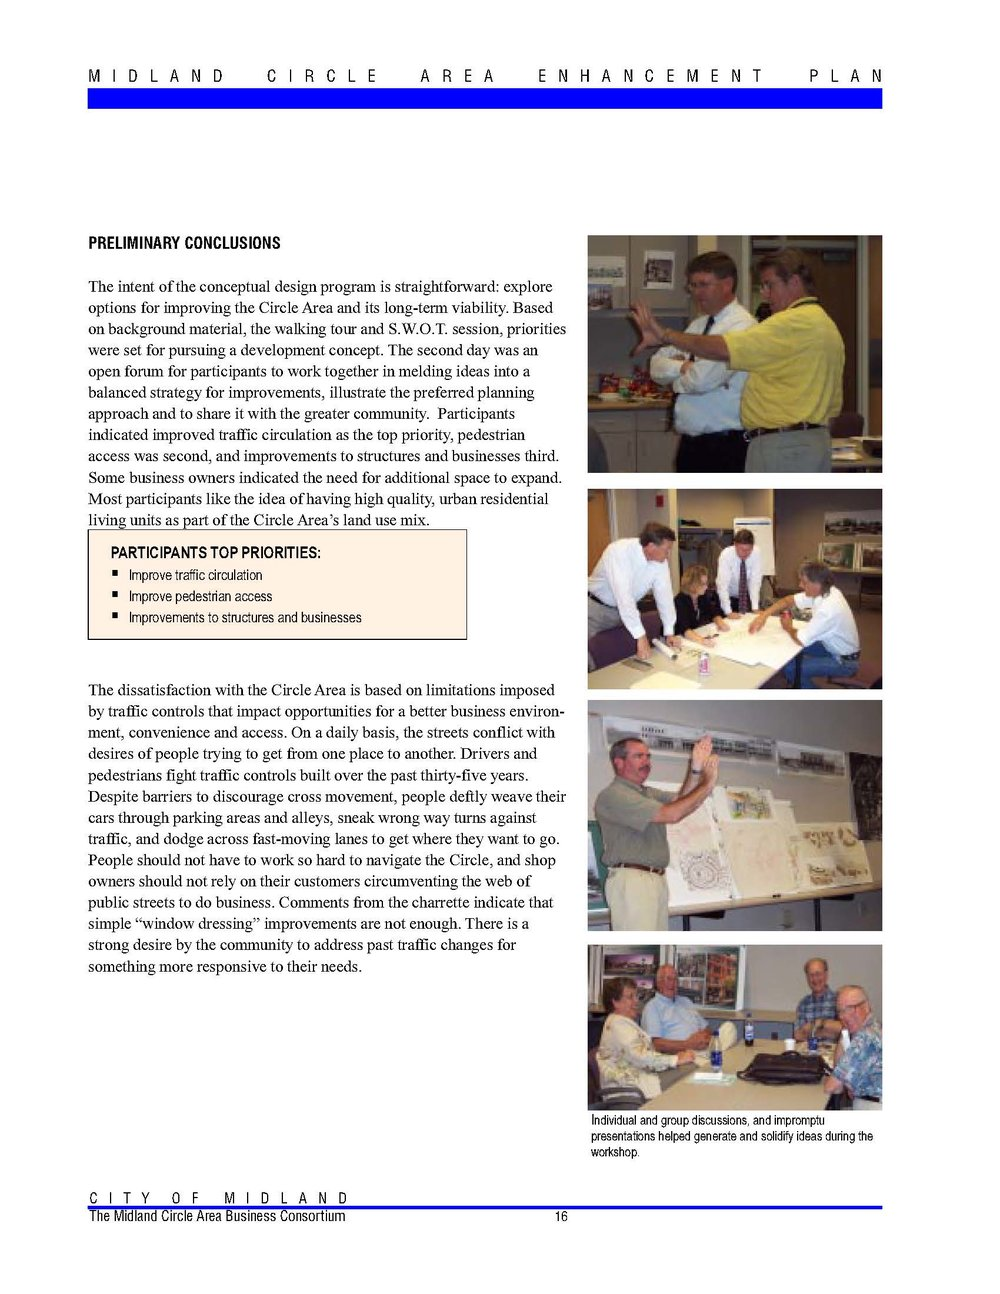 Ashman Circle Enhancement Plan_Page_18.jpg